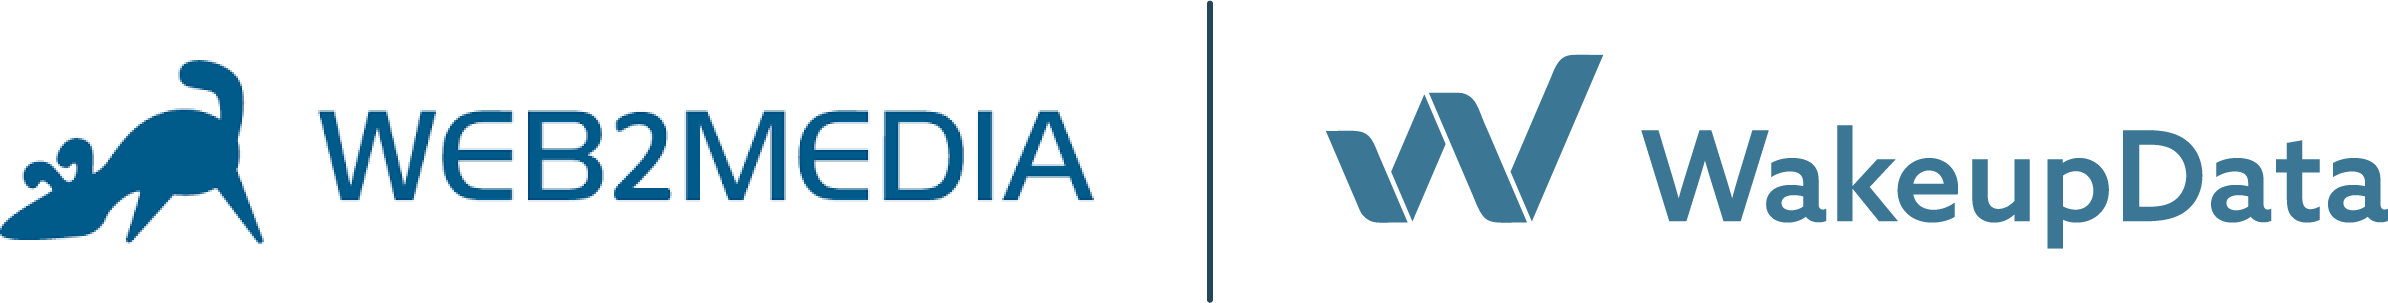 w2m-wud logos